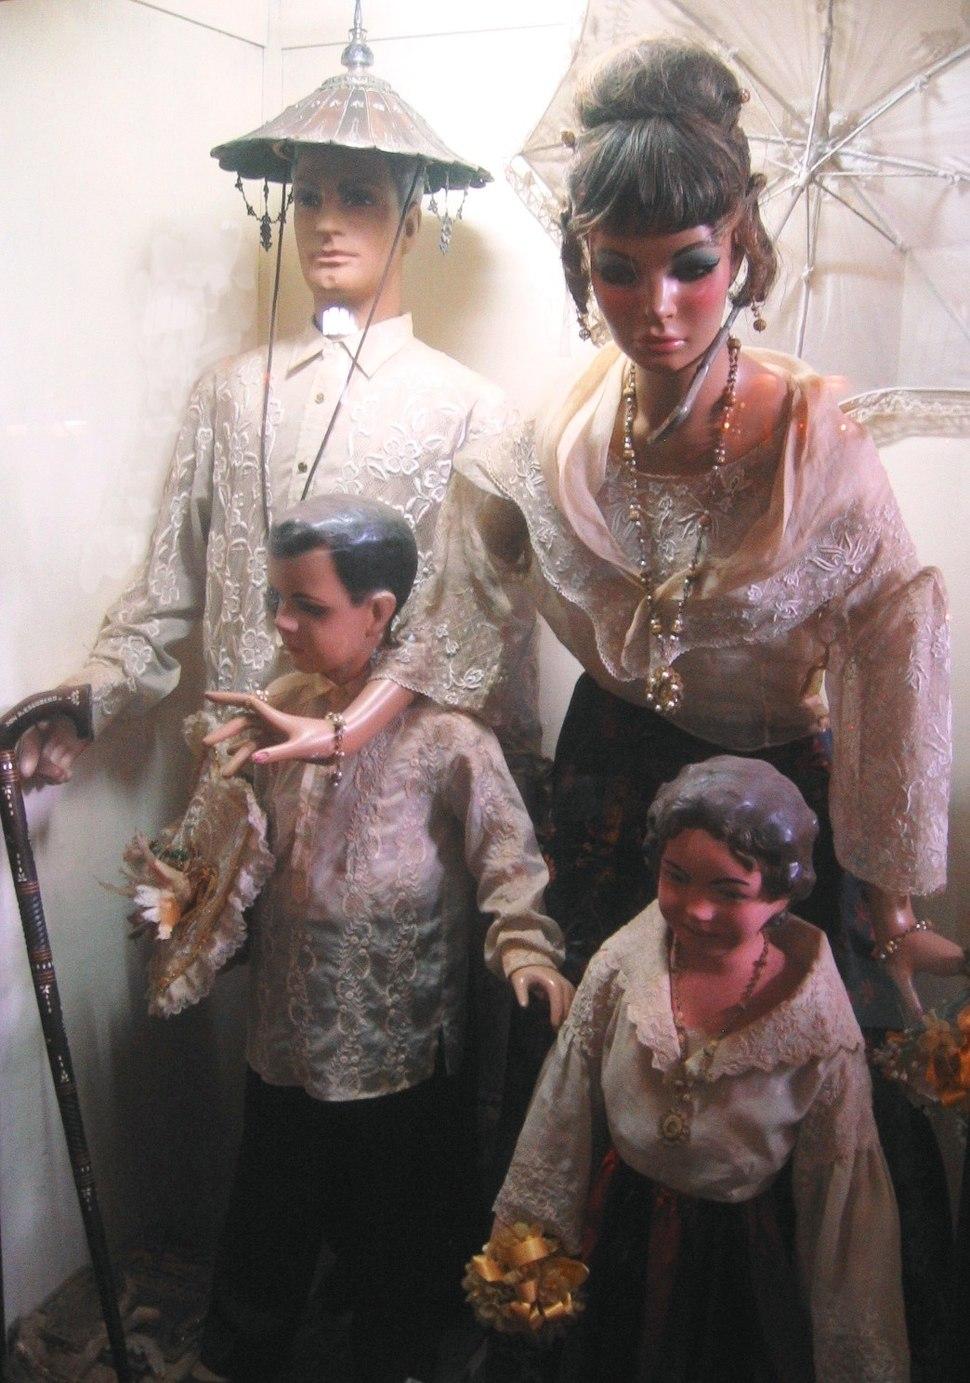 A family belonging to the Principalia